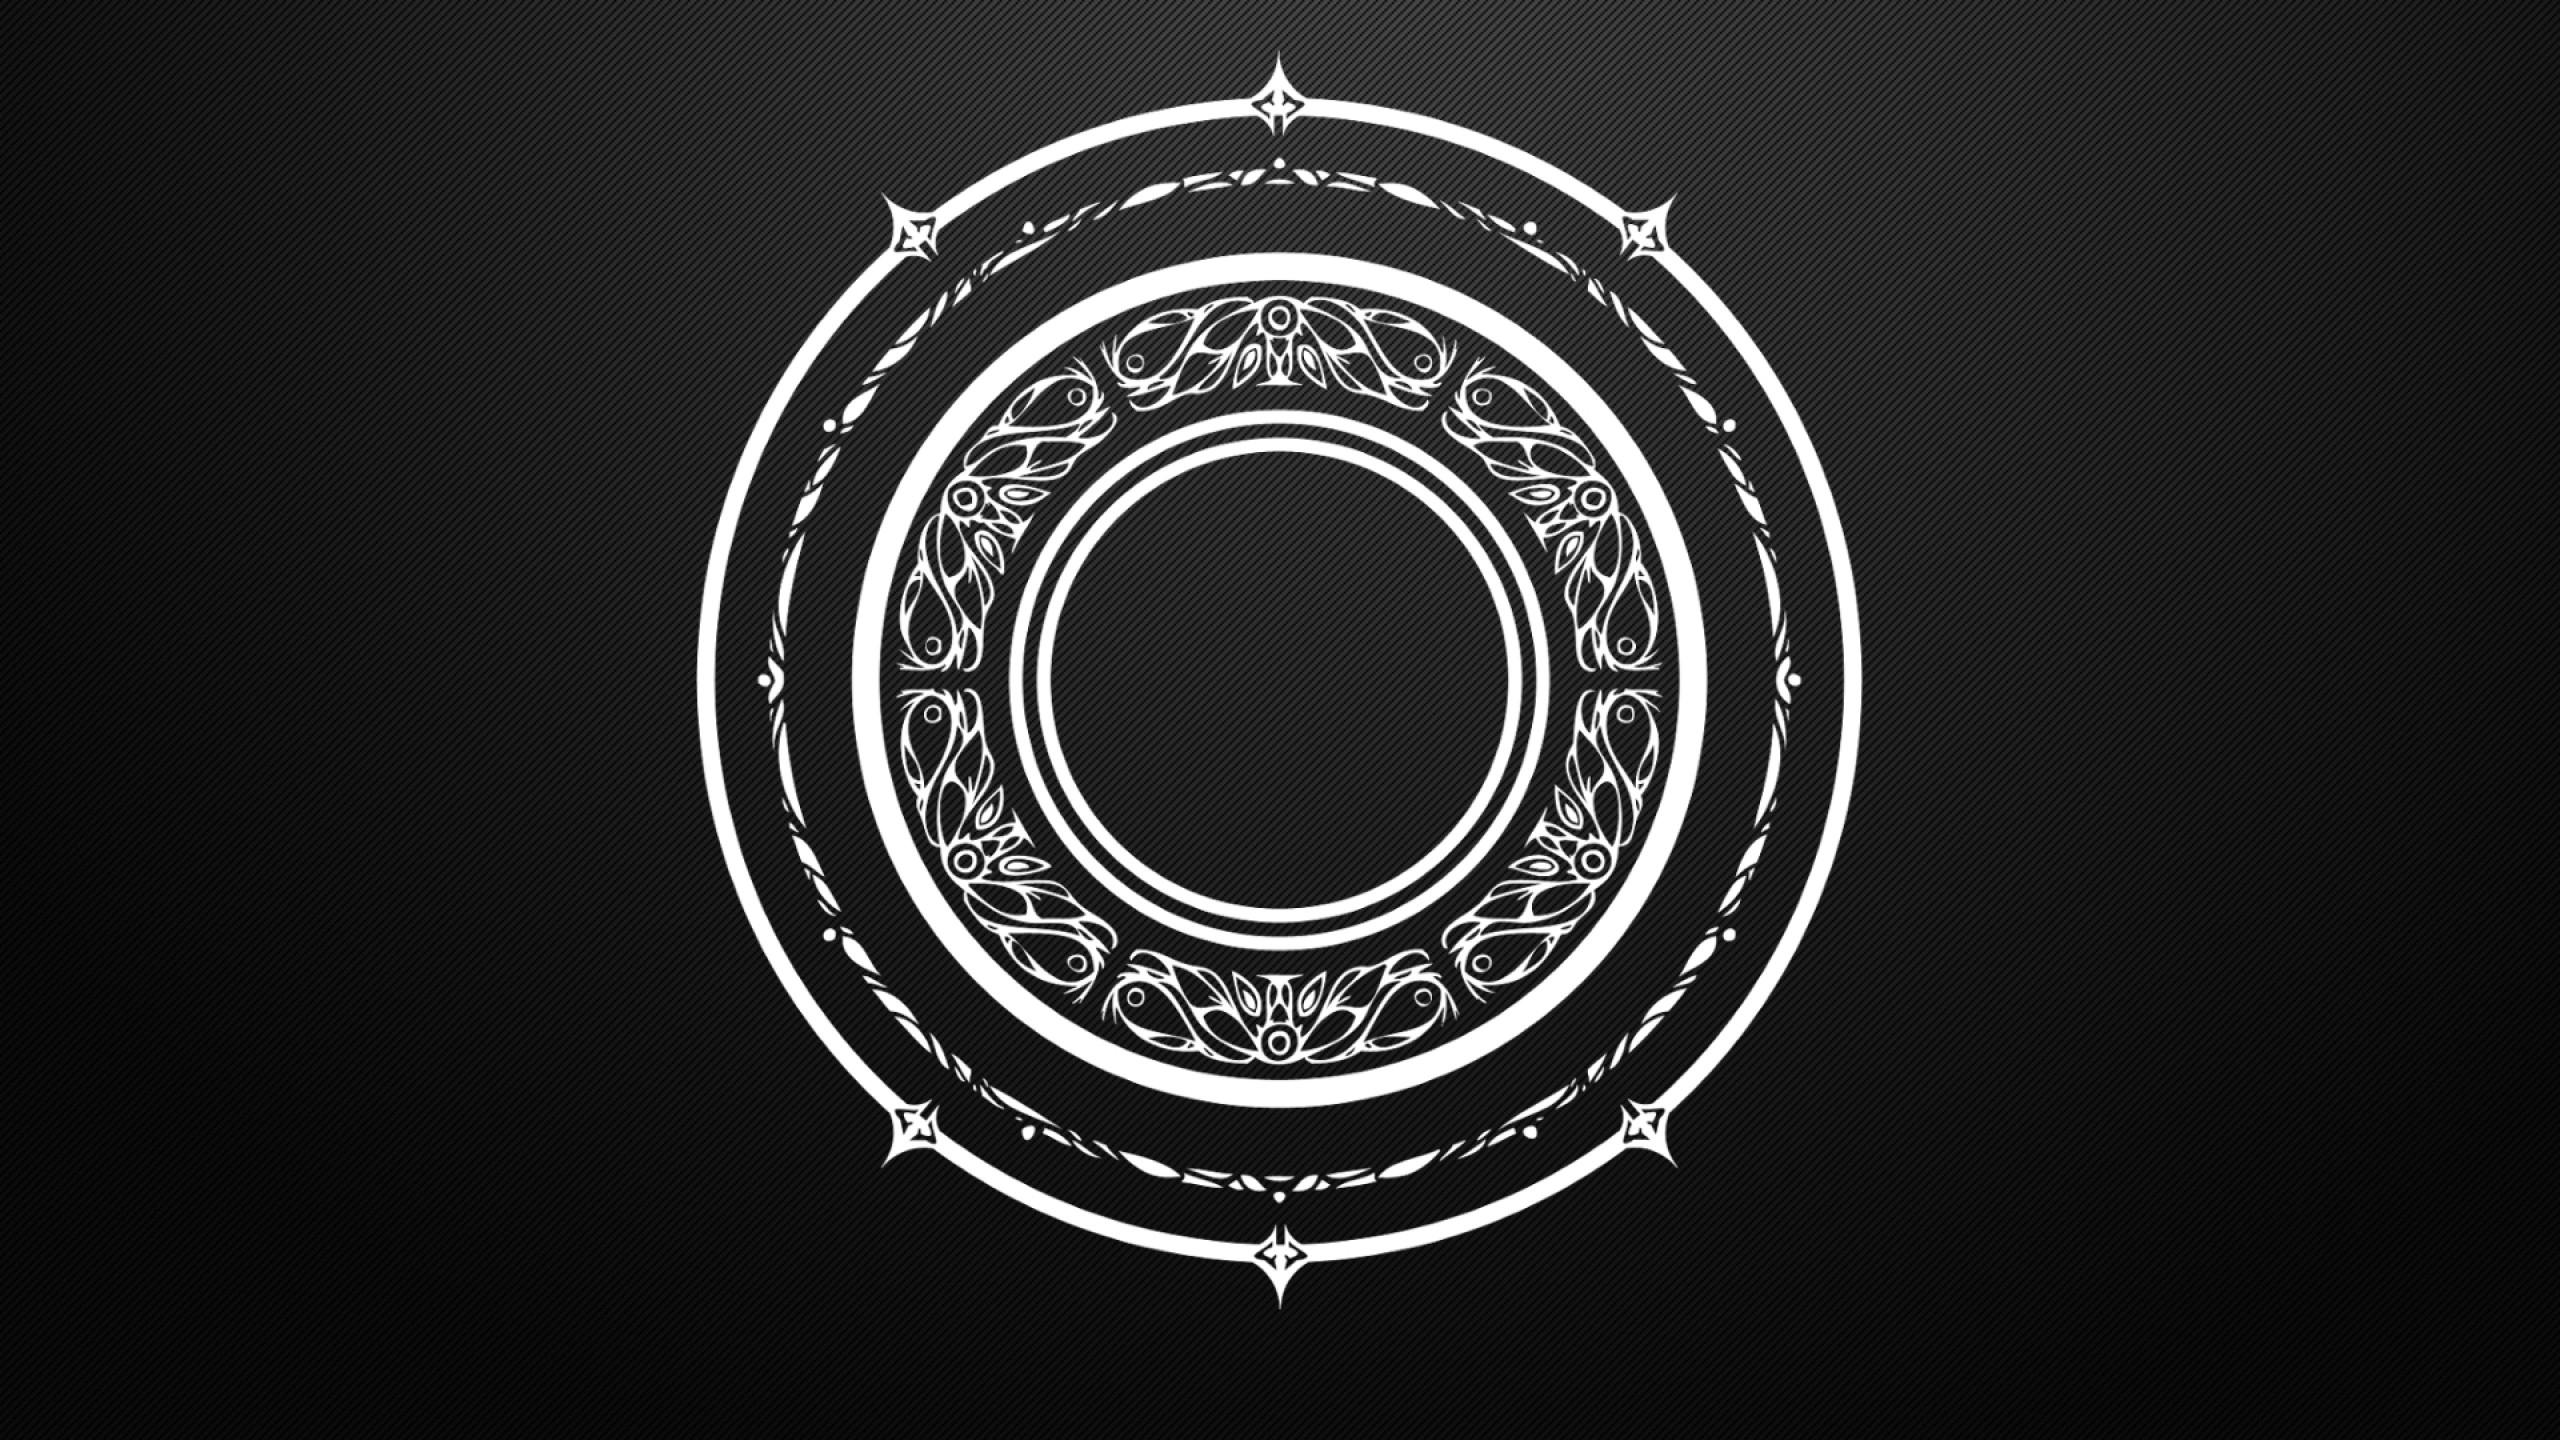 black and white circles magic arcane mandala tera online magic circles  1920×1080 wallpaper Wallpaper HD